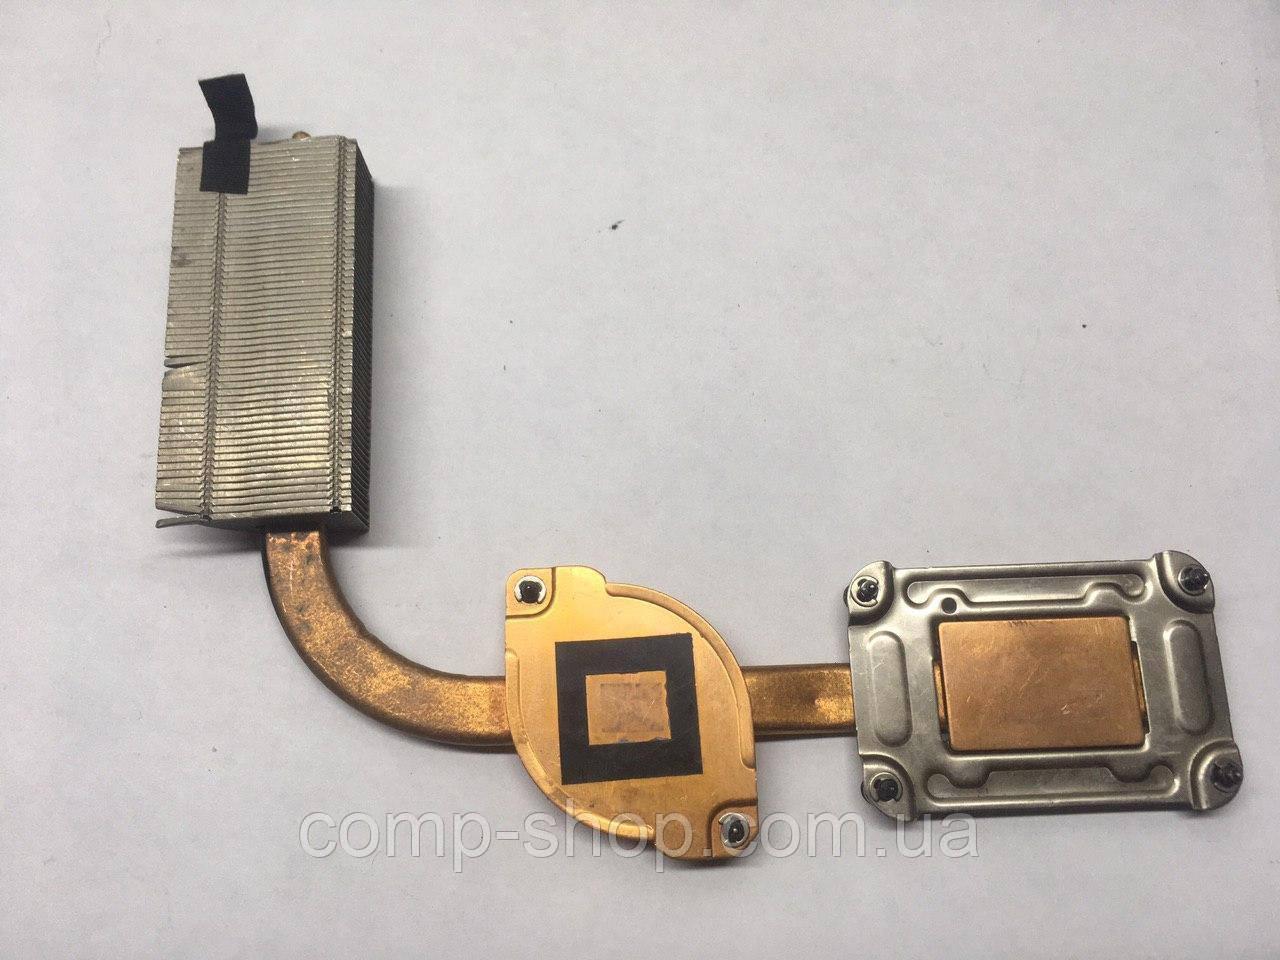 Радиатор (термоблок, термотрубка) 6043B0092701 для ноутбуков HP ProBook 4530S 4730S